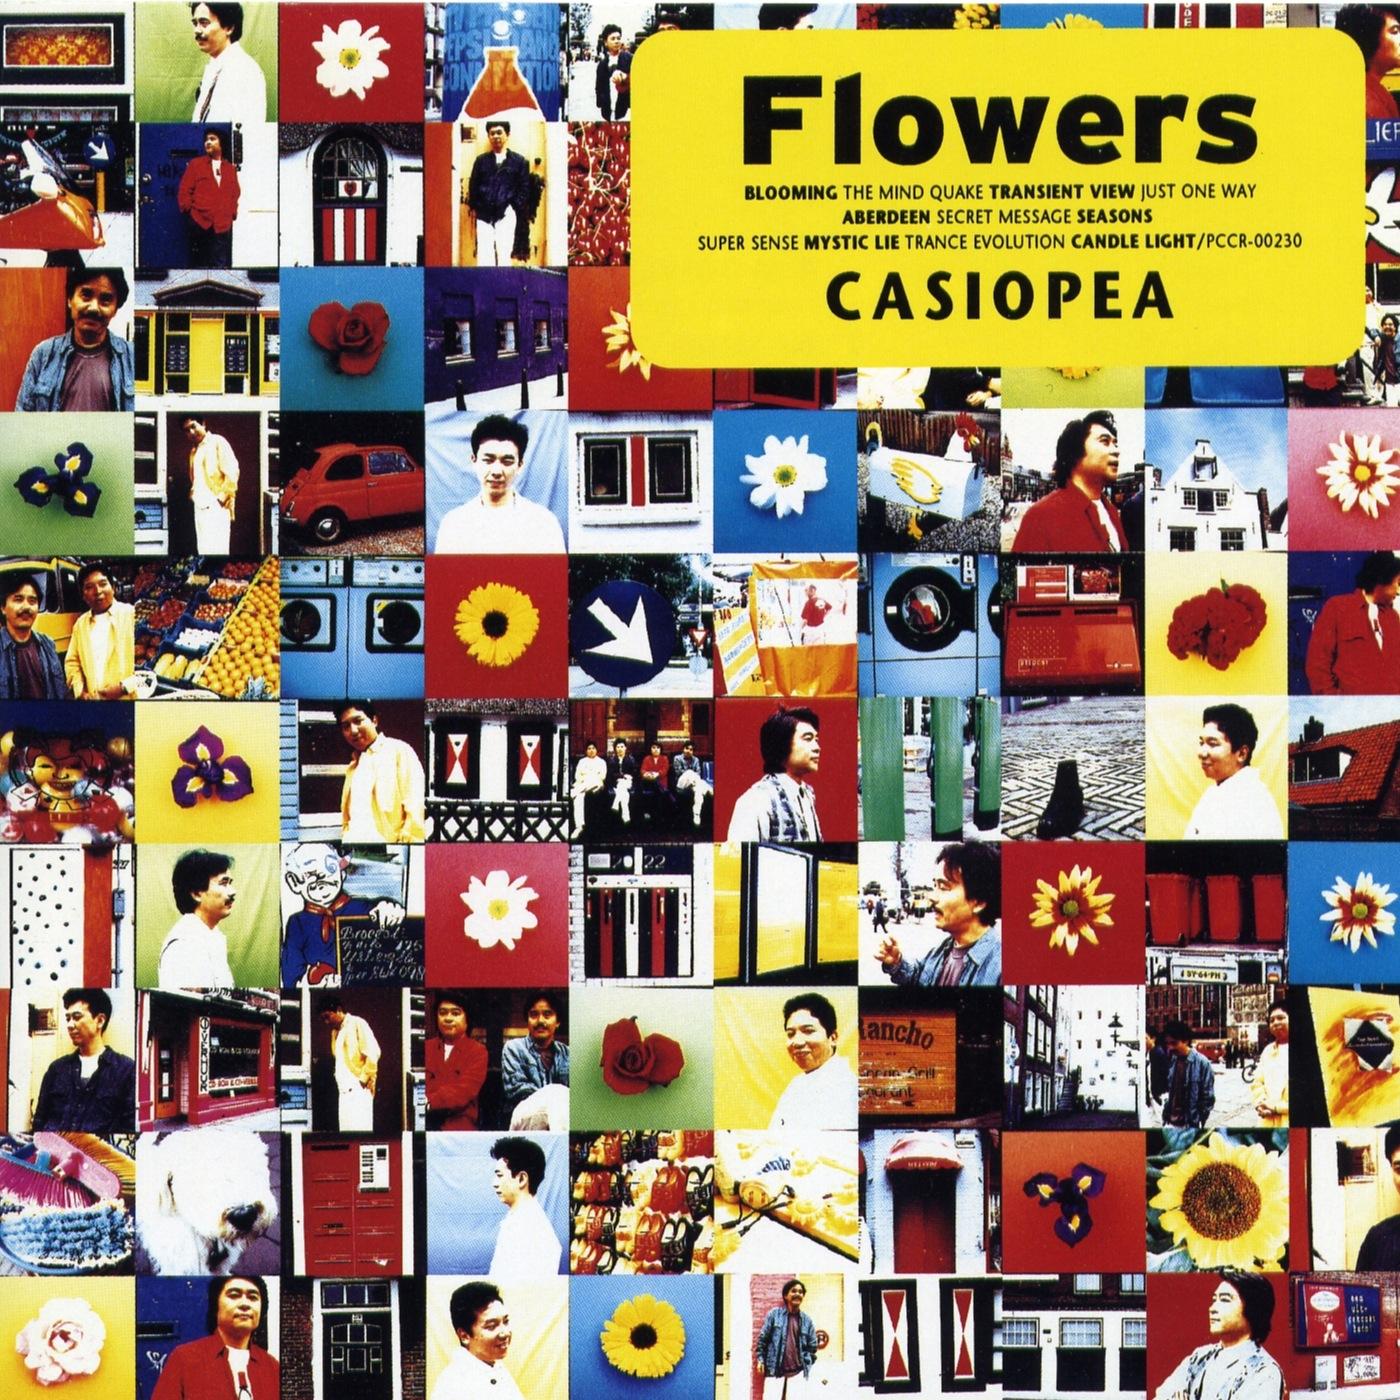 Casiopea - Flowers